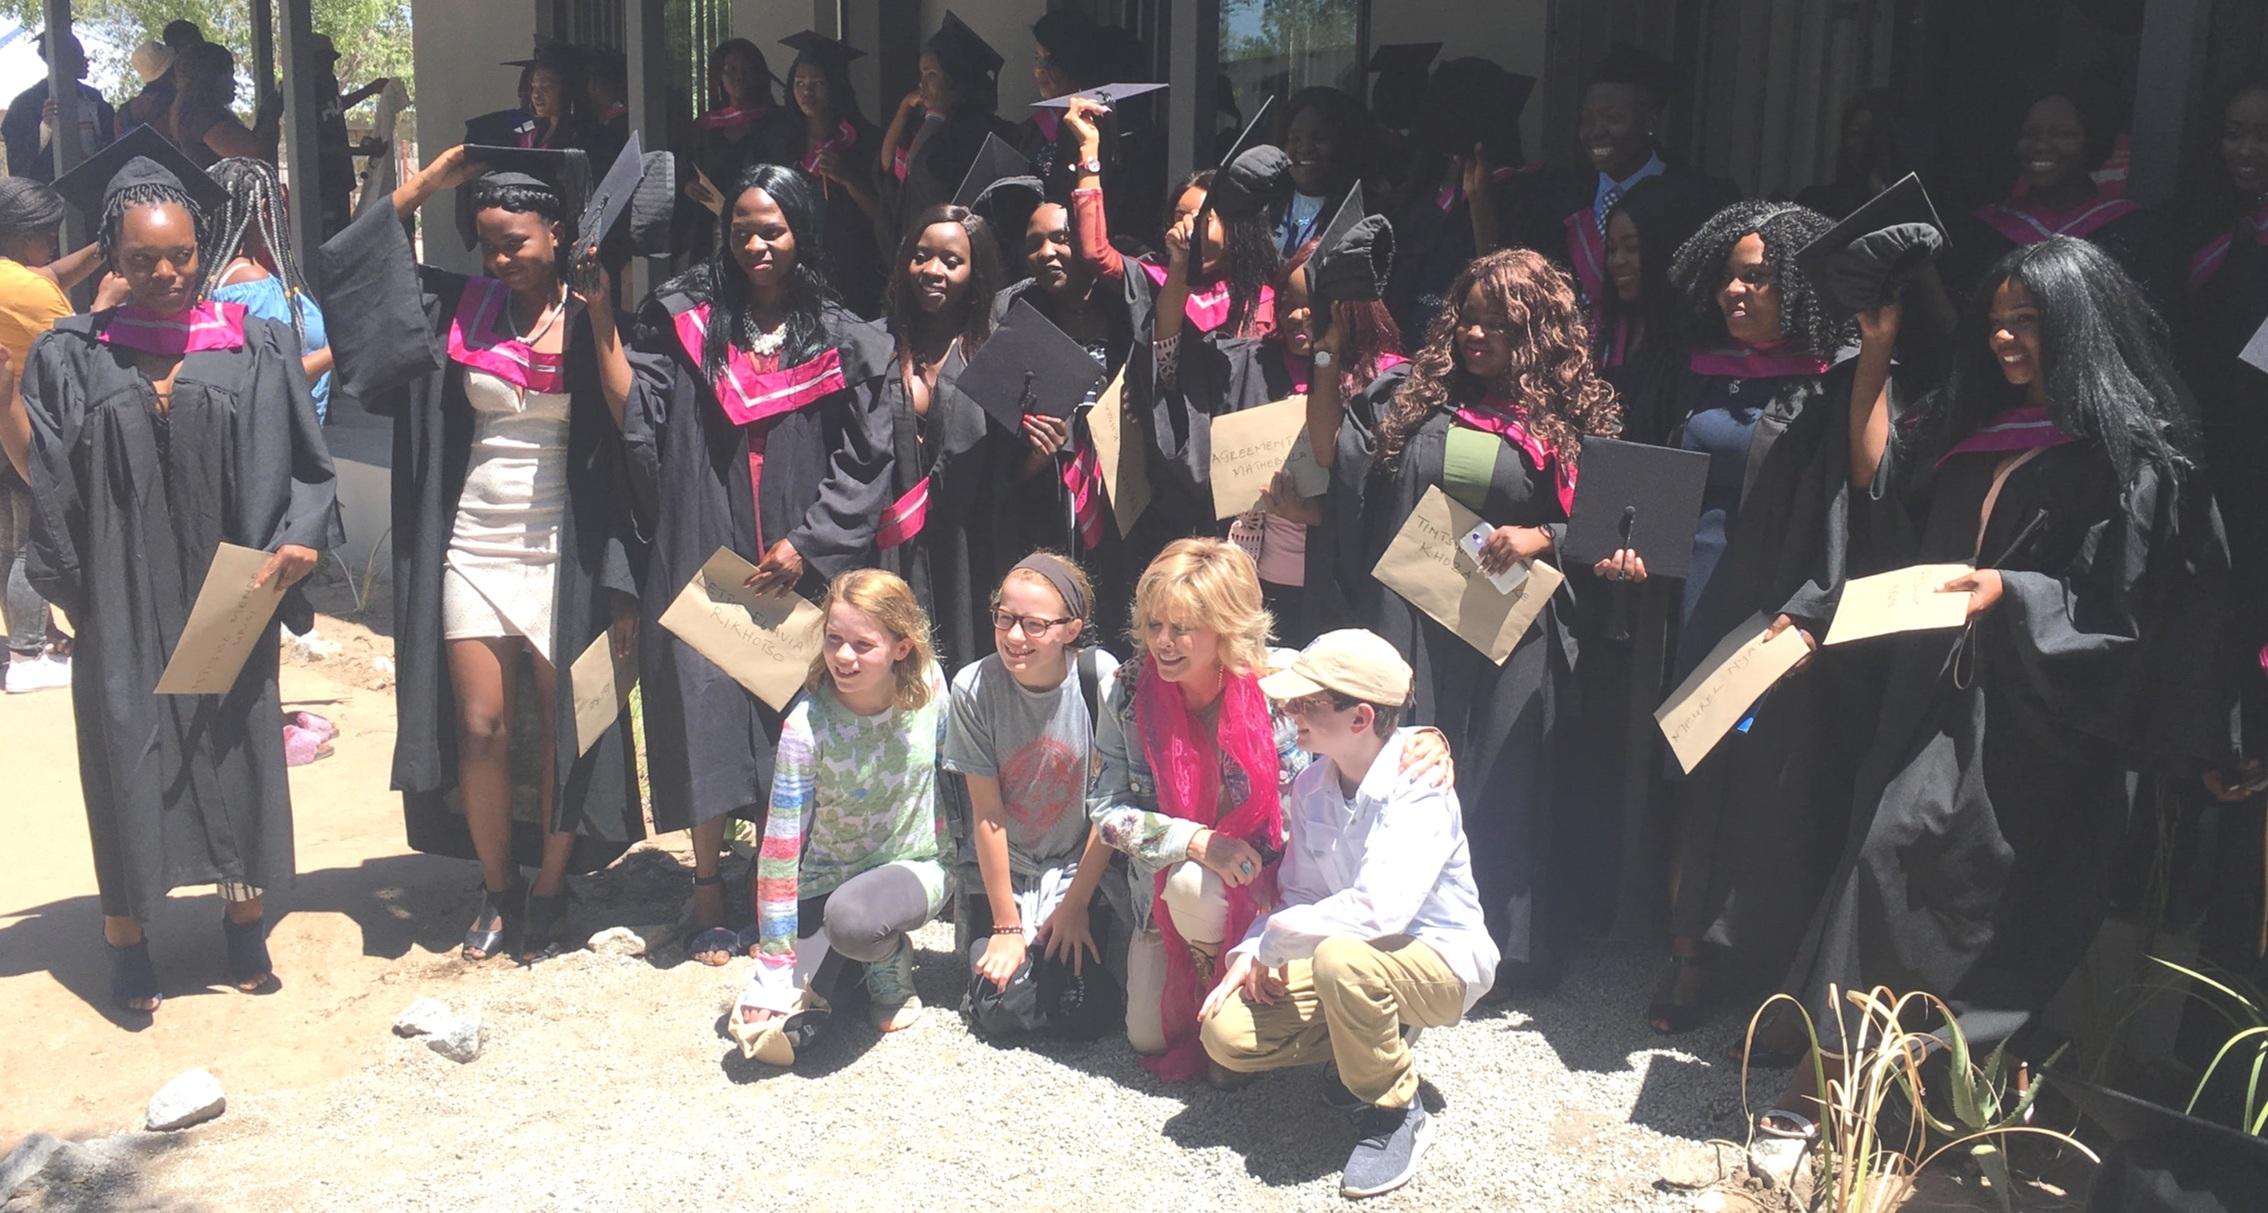 Graduates, Pat and her grandchildren celebrating after the graduation ceremony.